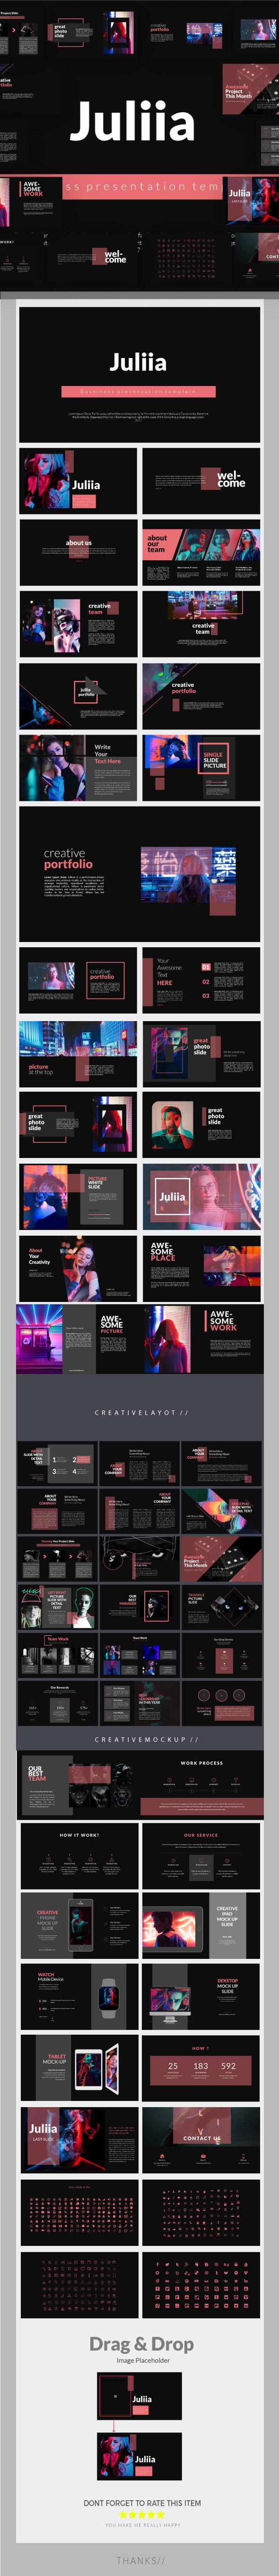 GraphicRiver Juliia Multipurpose Presentation Templates 21111083